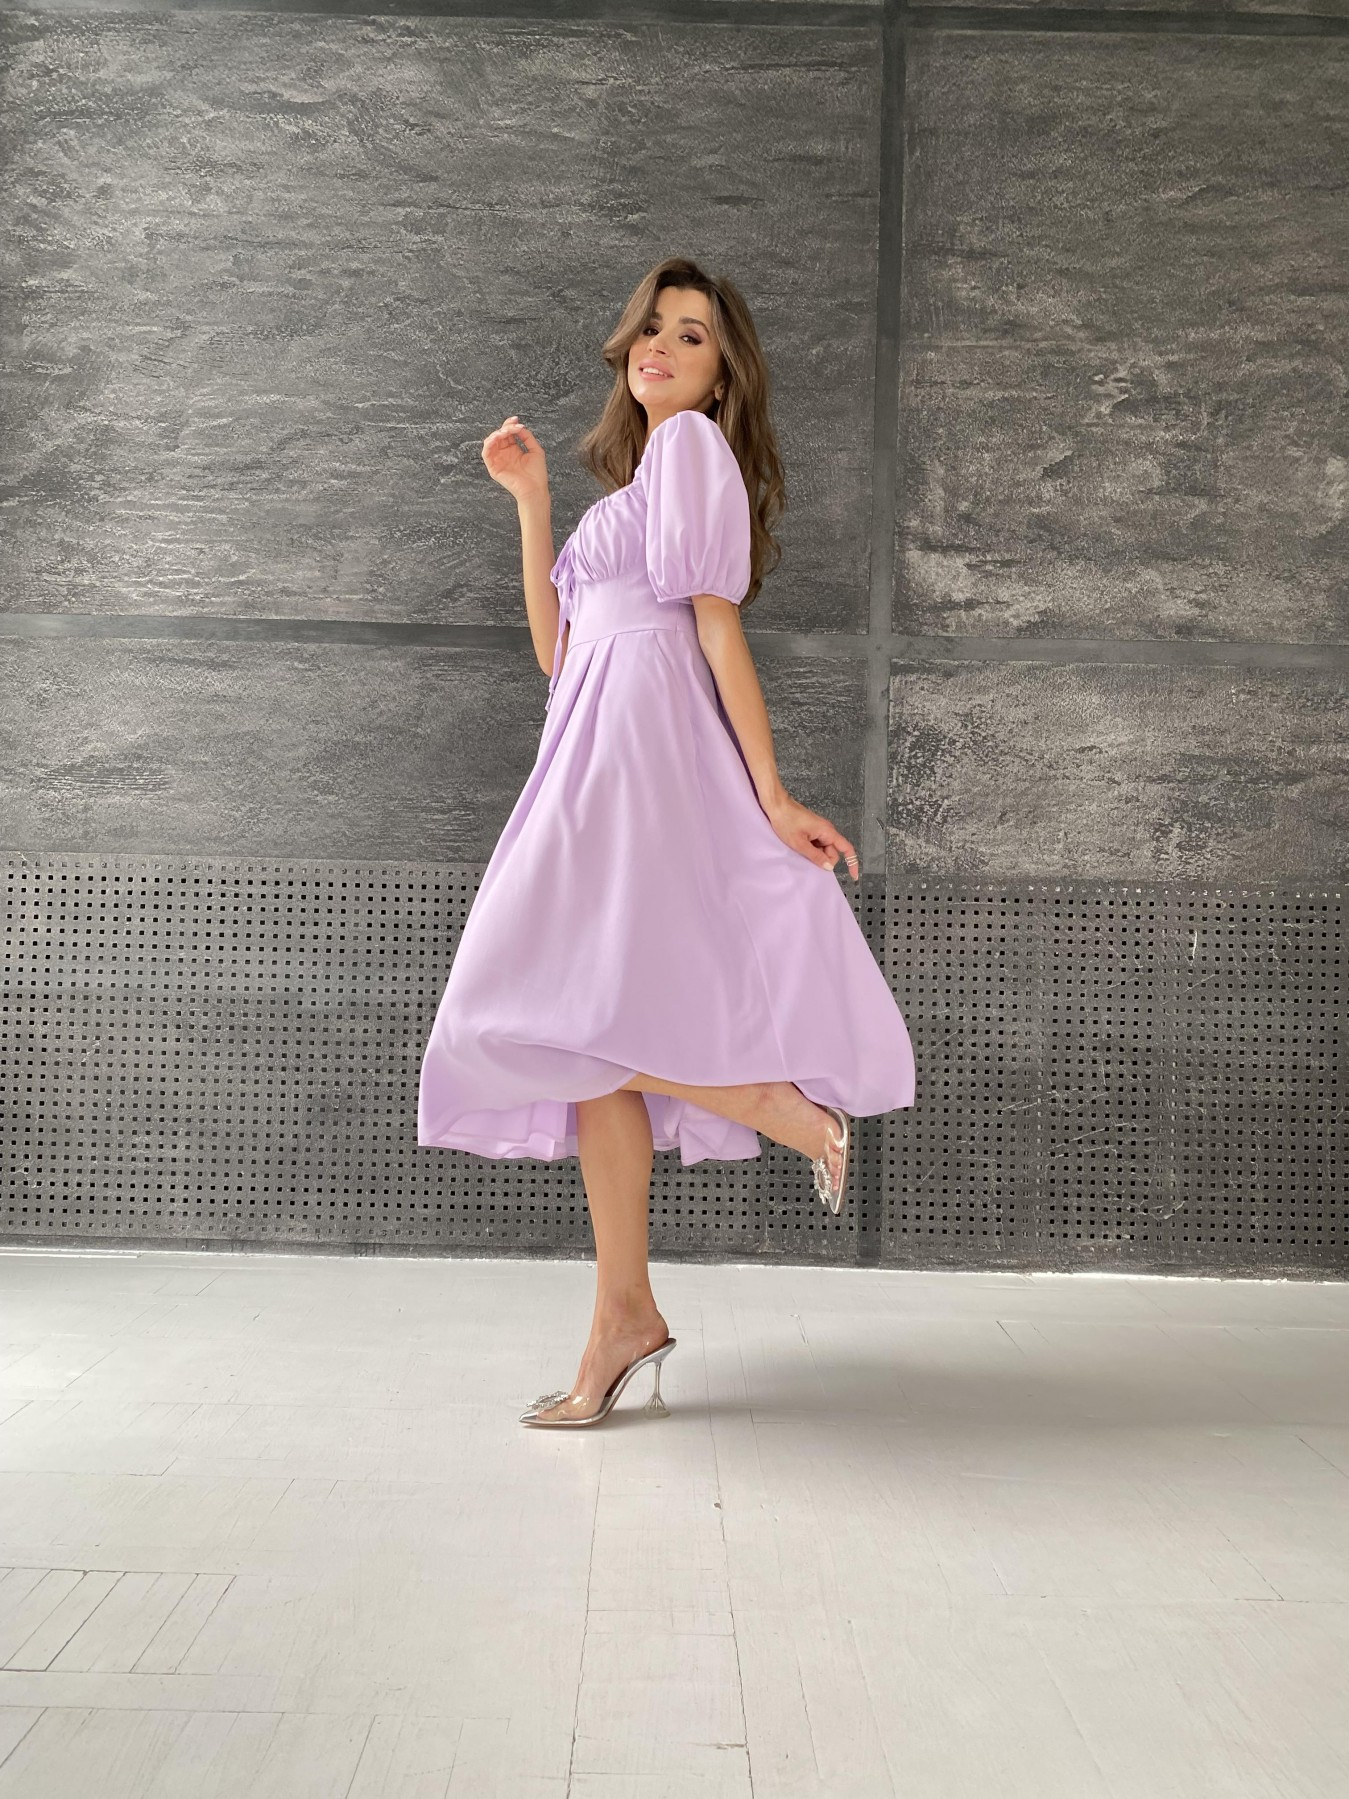 Кисес Миди платье из шифона креп 11443 АРТ. 48311 Цвет: Лаванда - фото 4, интернет магазин tm-modus.ru